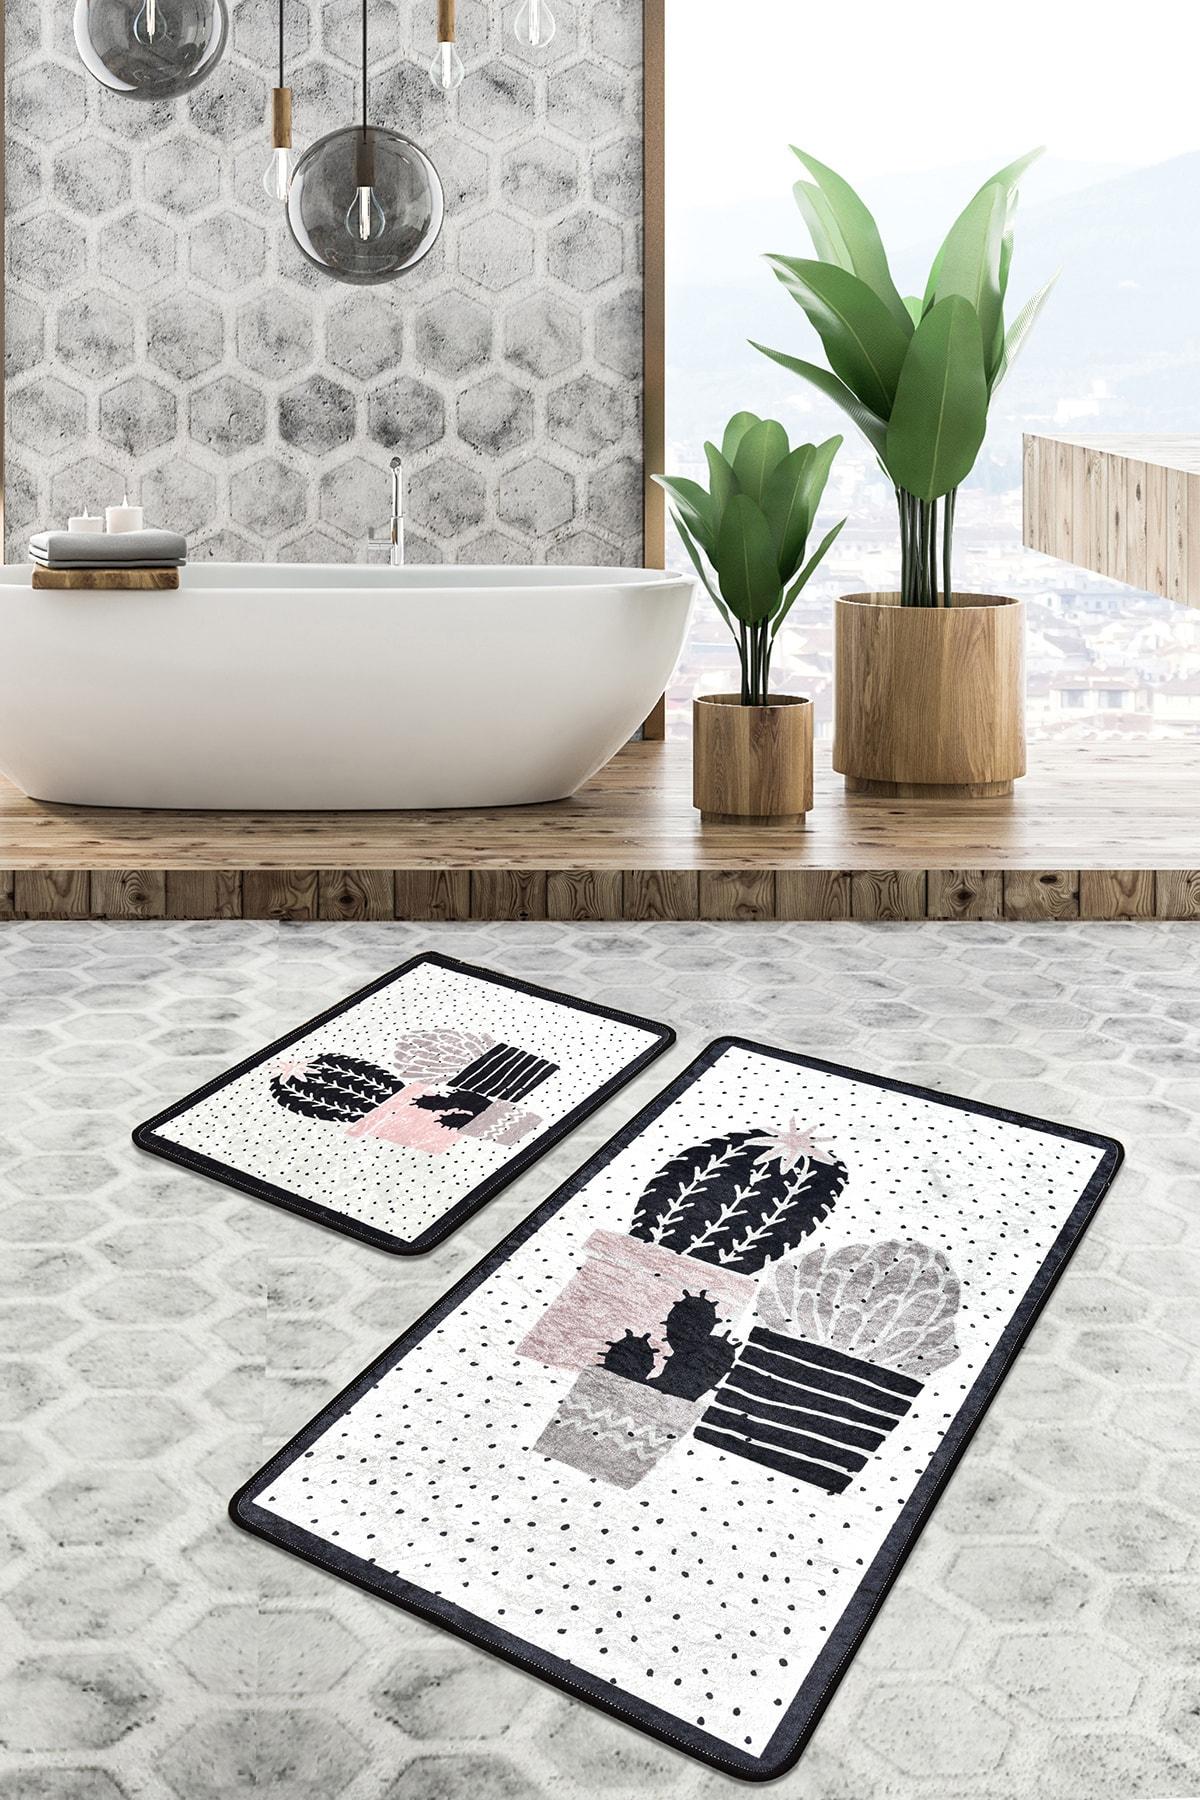 Chilai Home Three Cactus Djt 2 Li Set Banyo Paspası 1